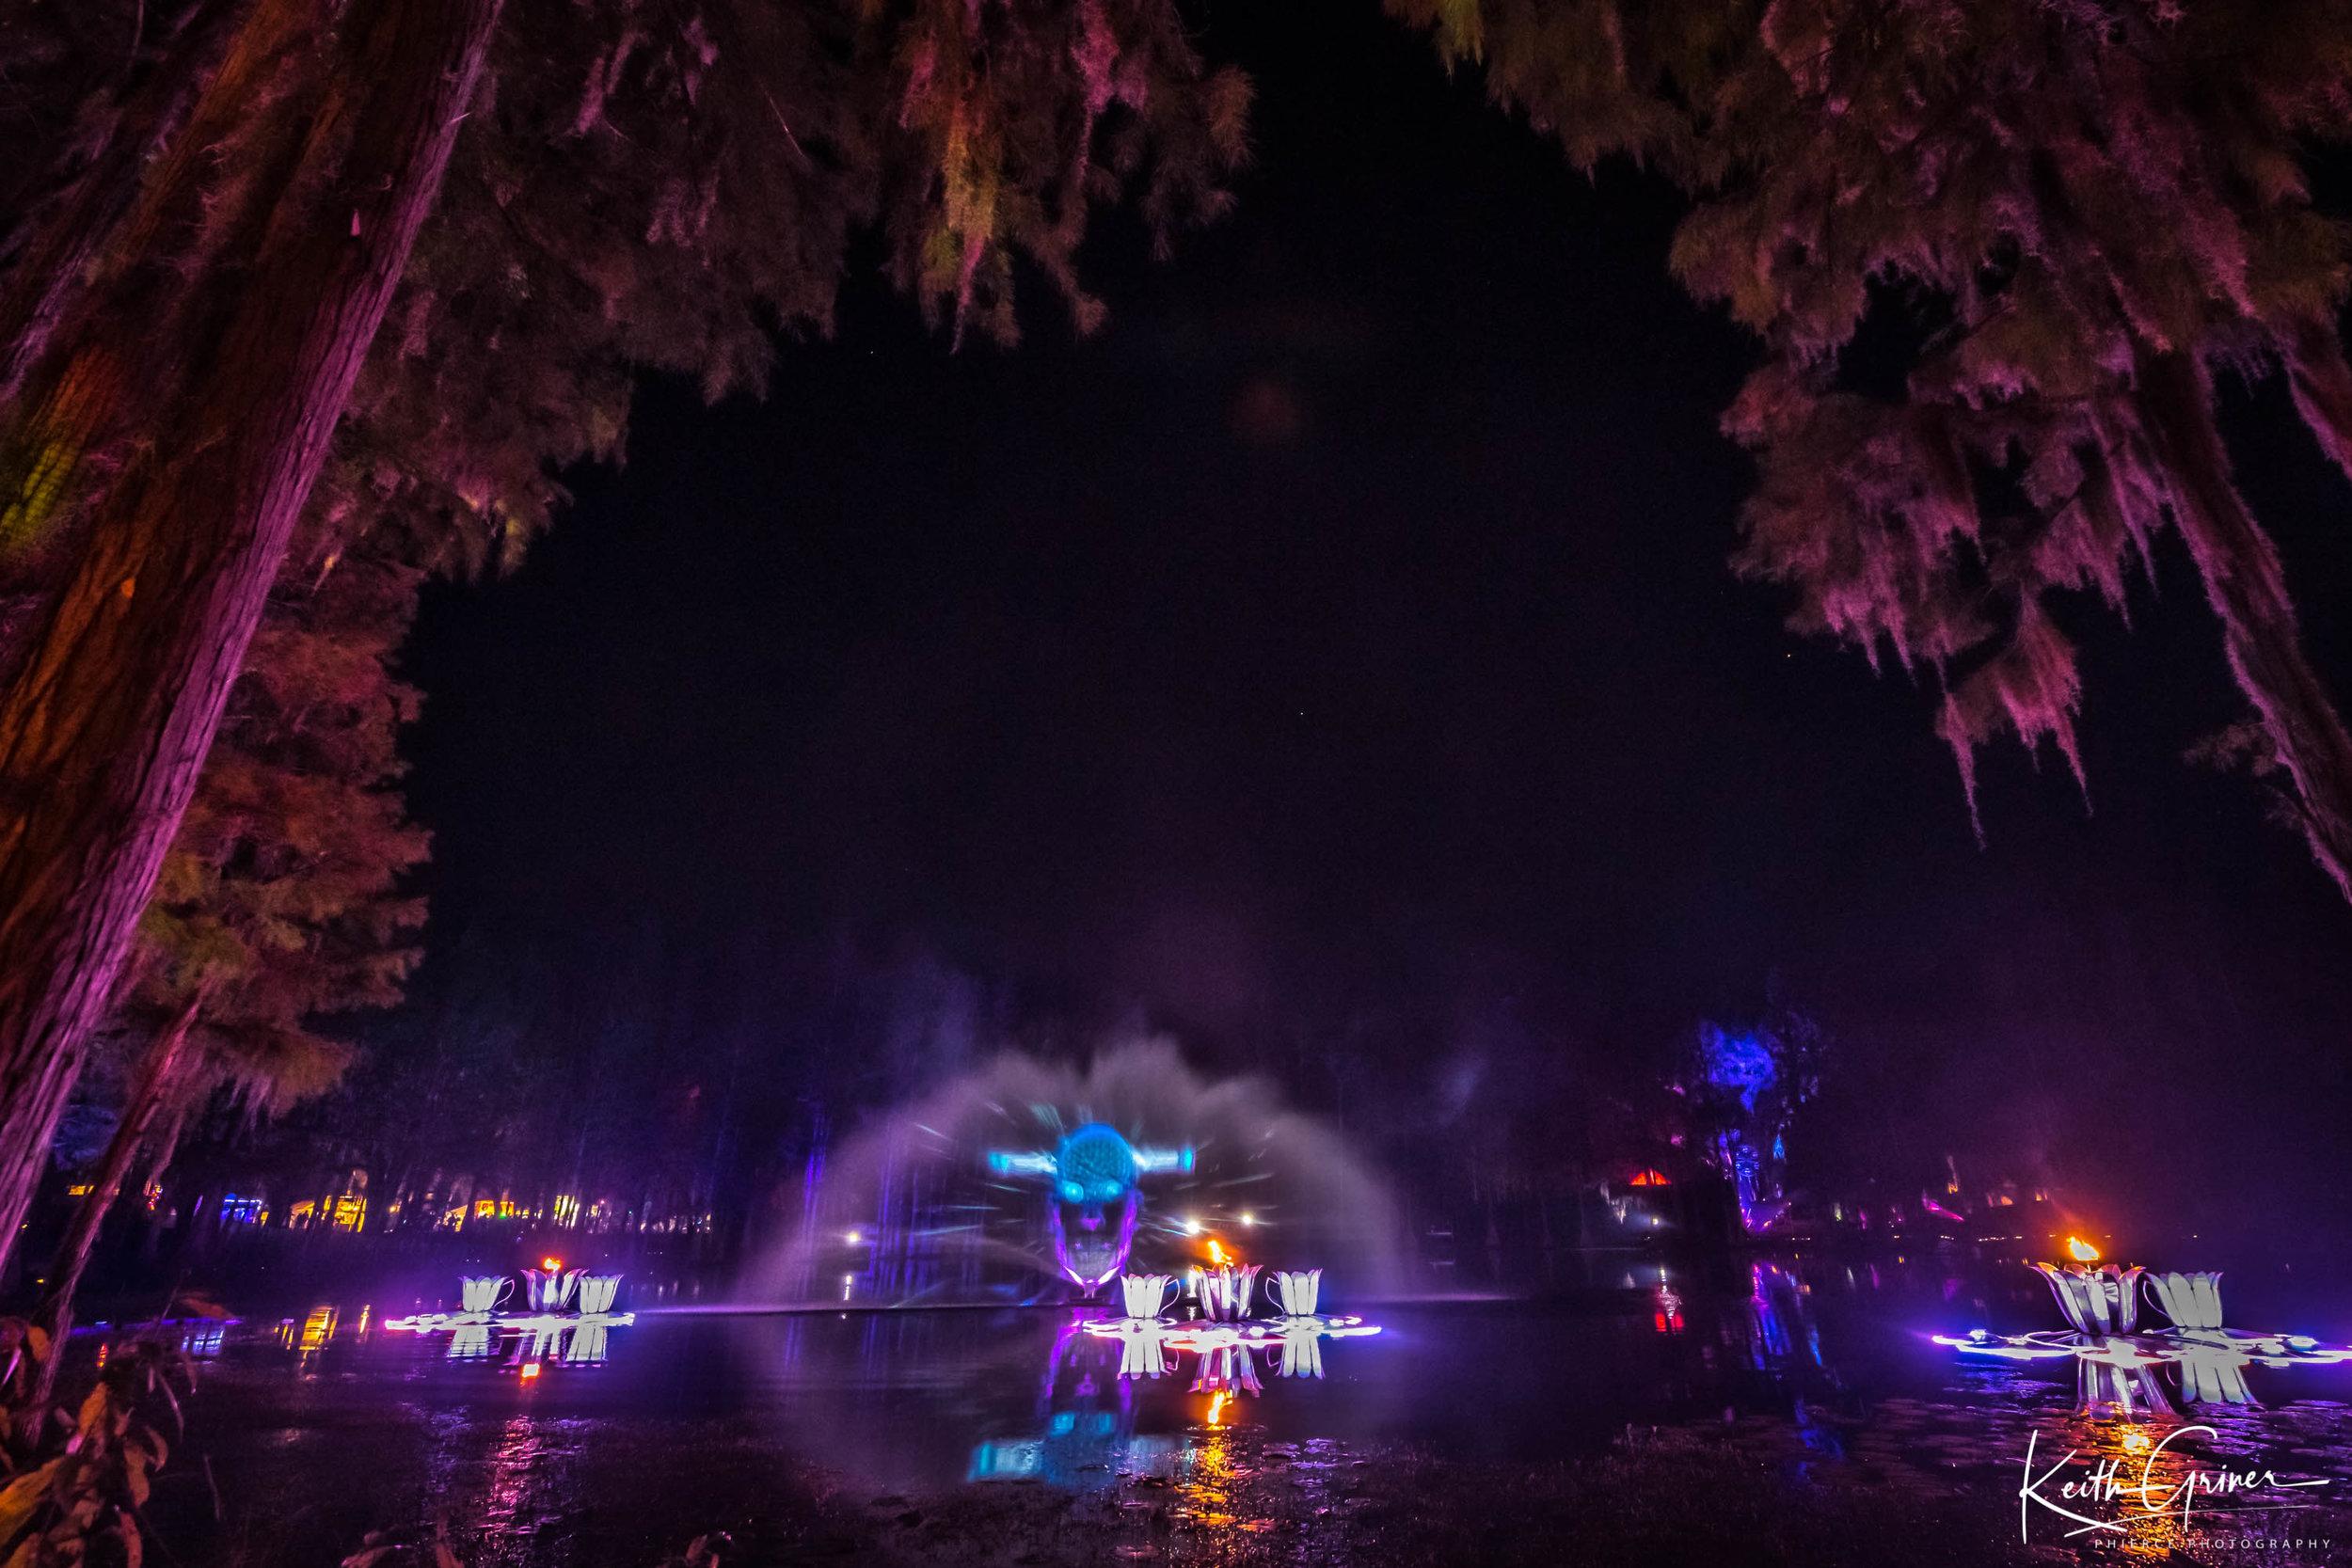 Hula_Spirit Lake_by Keith Griner 0D5_3175-Edit.jpg